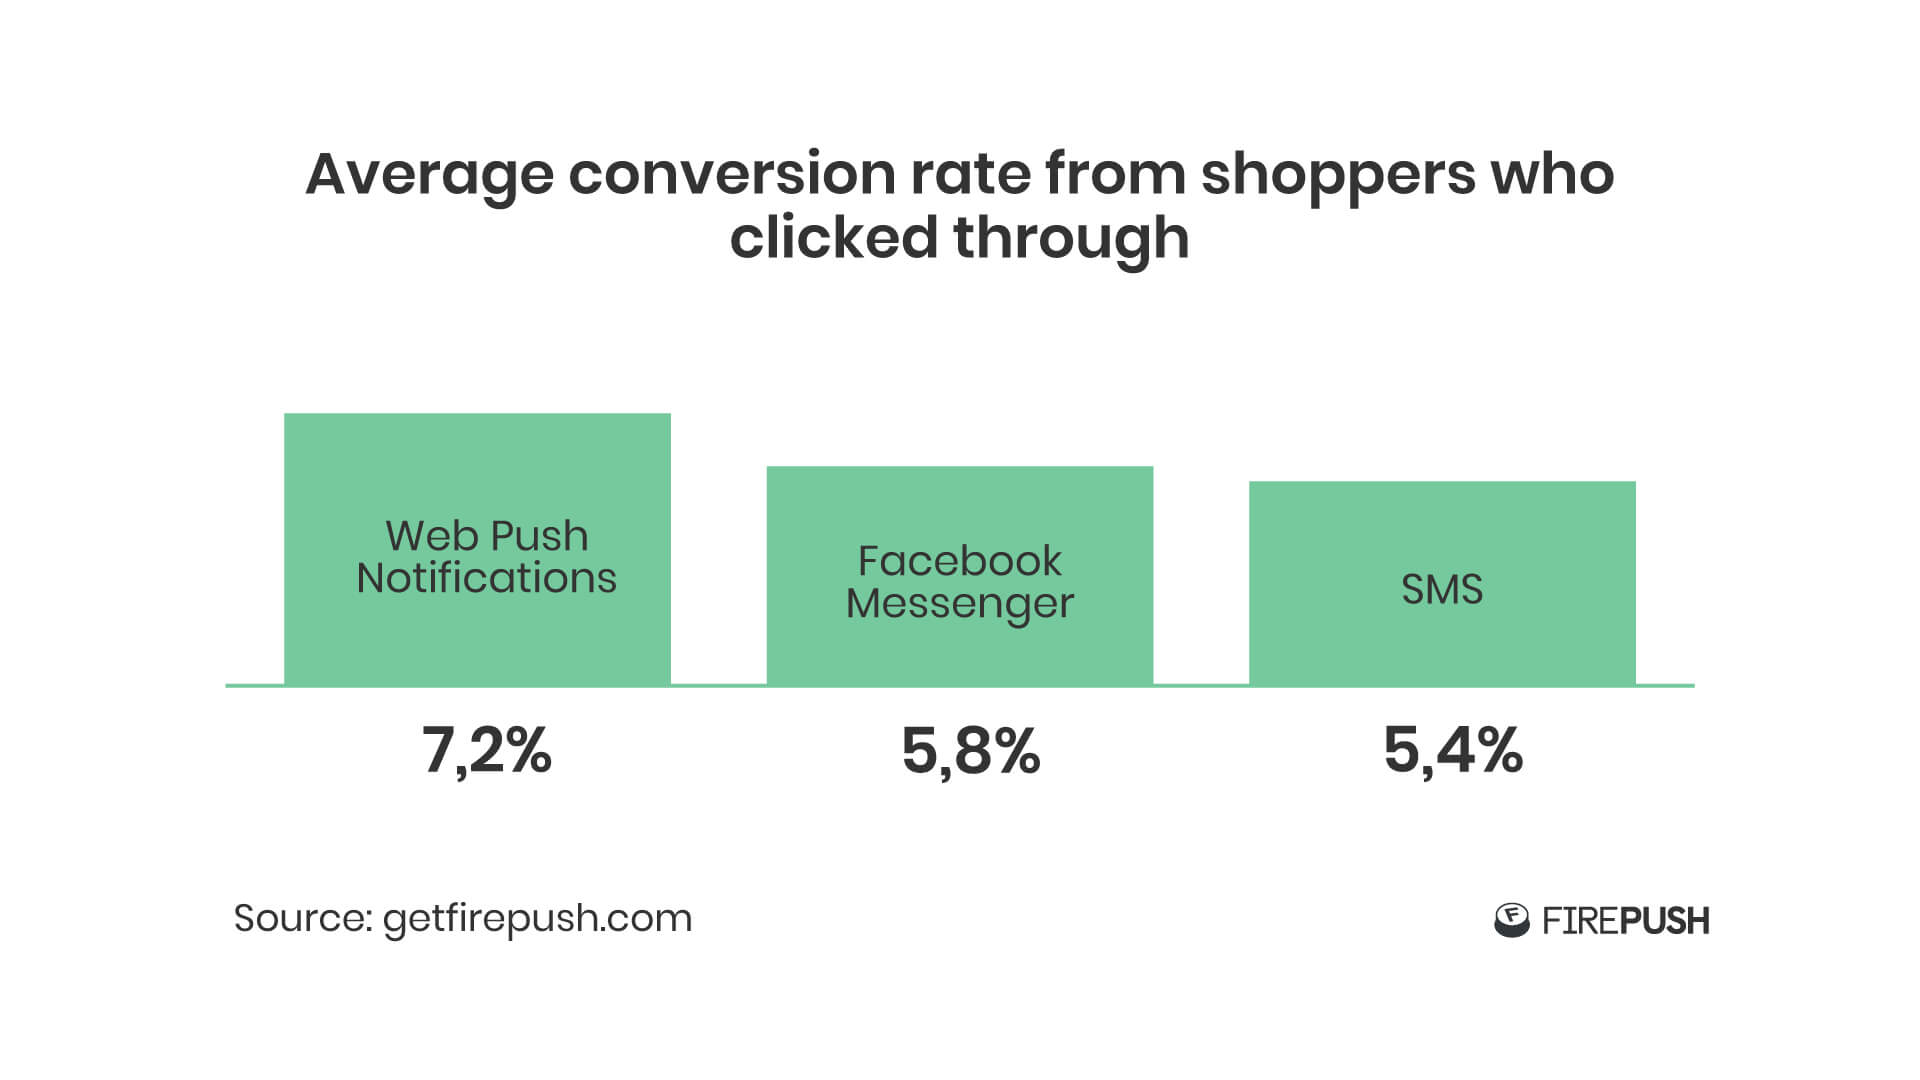 Firepush web push notification conversion rate statistics